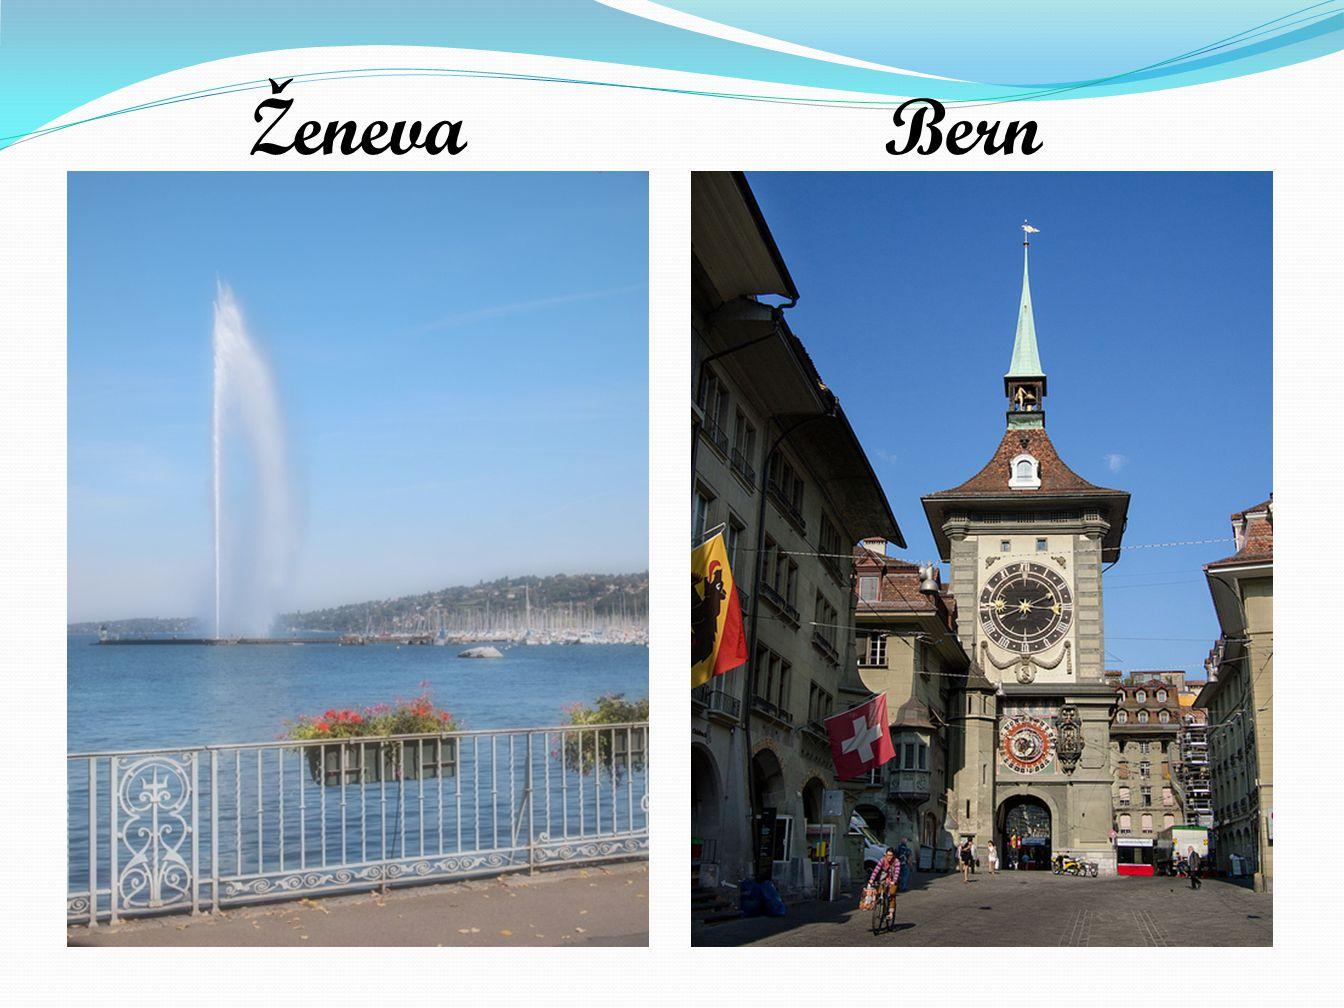 Ženeva Bern